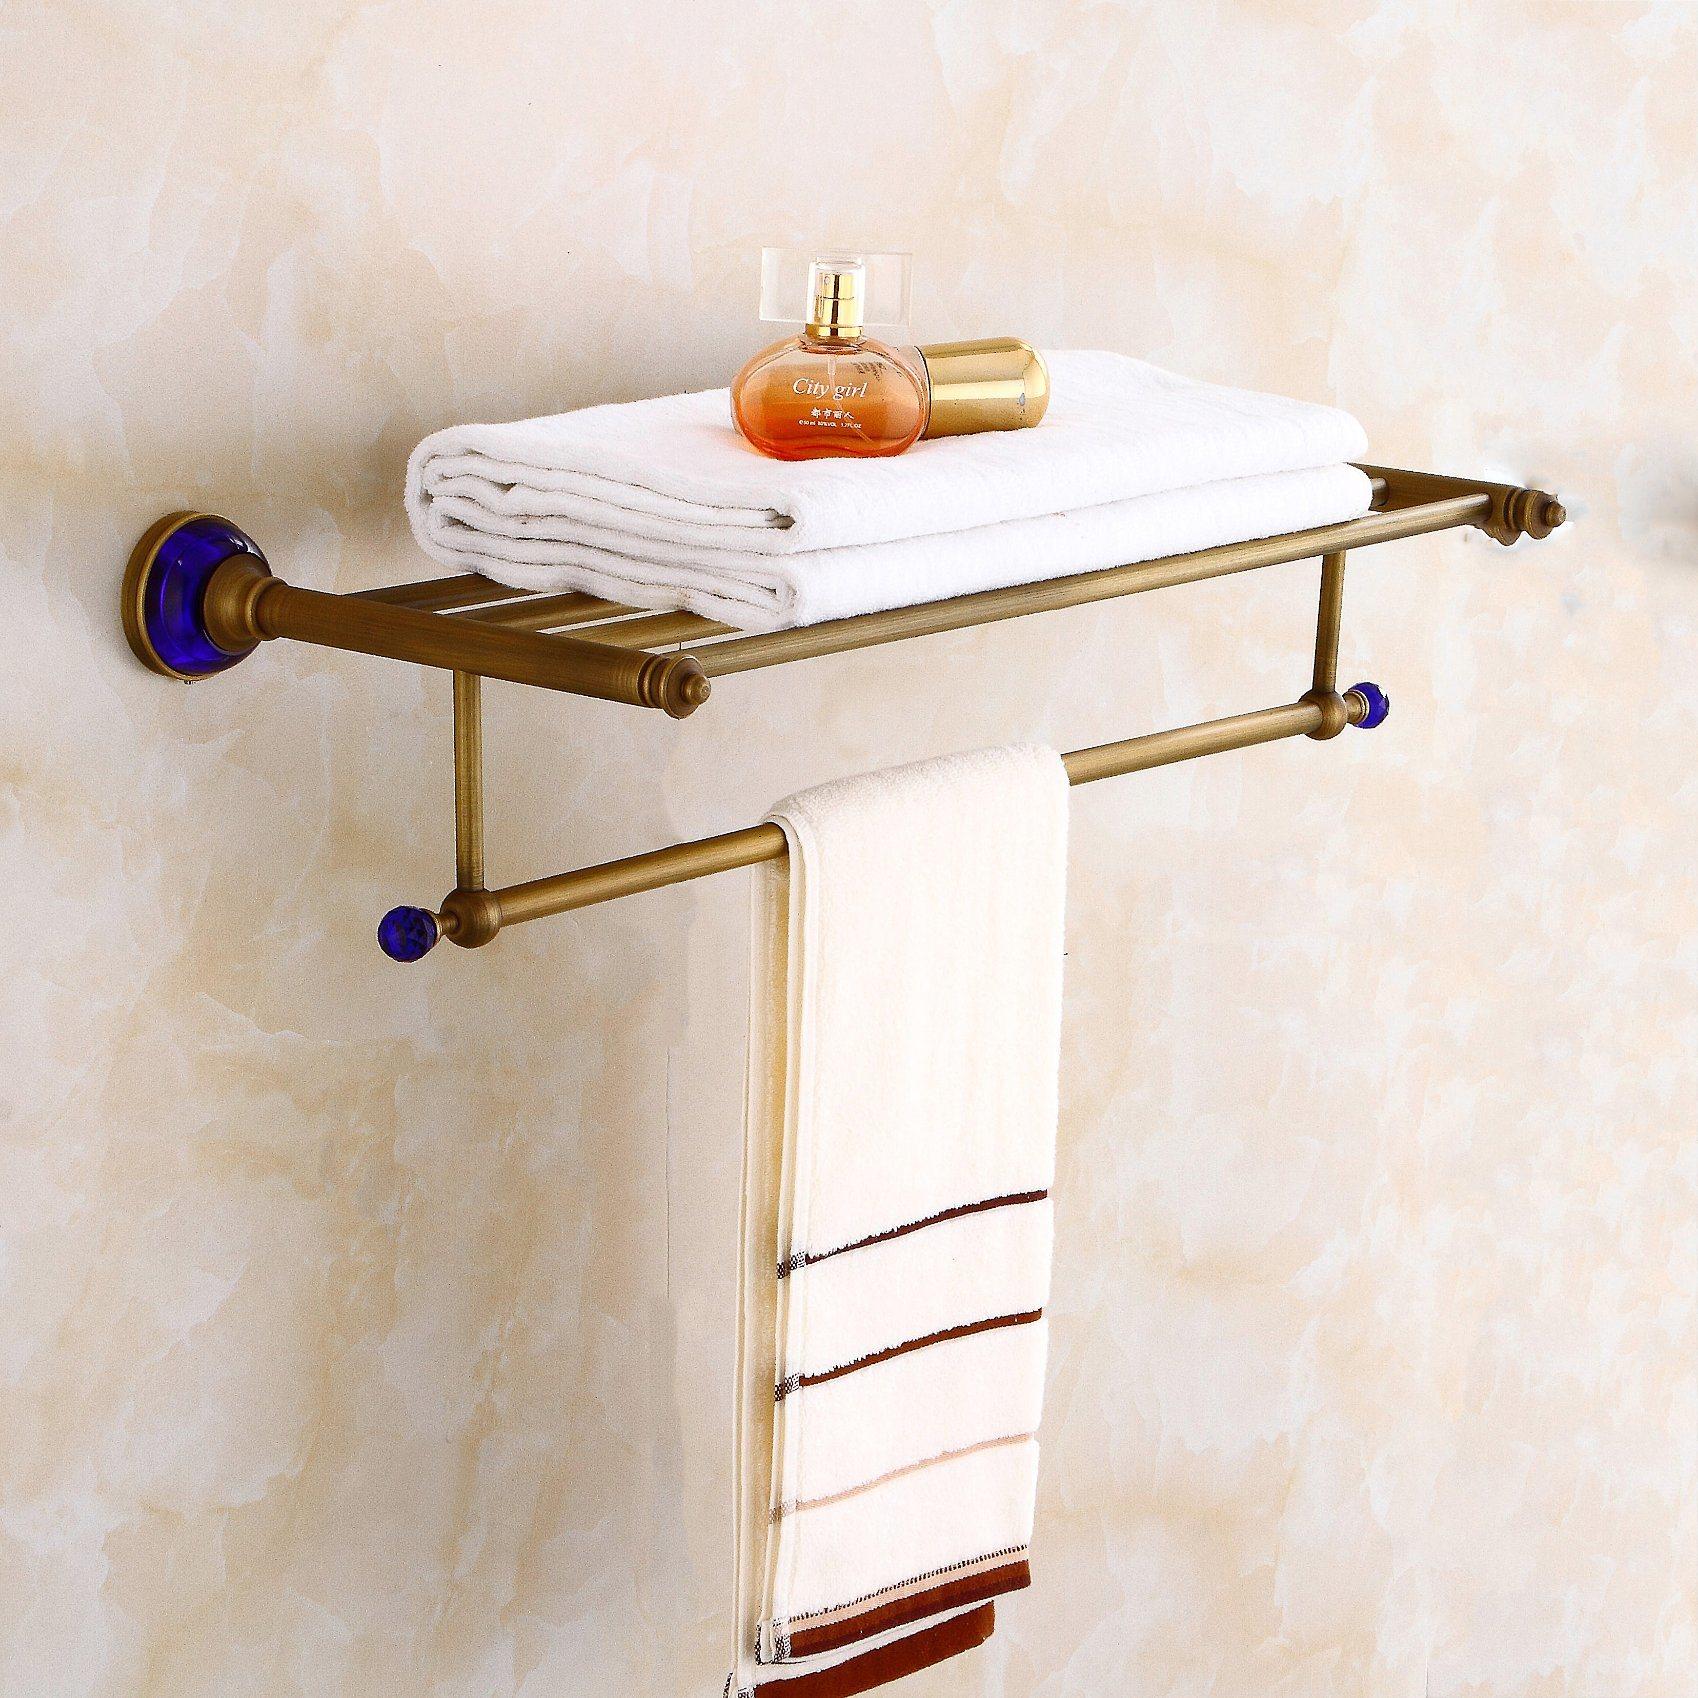 China Flg Bathroom Shelf Bath Towel